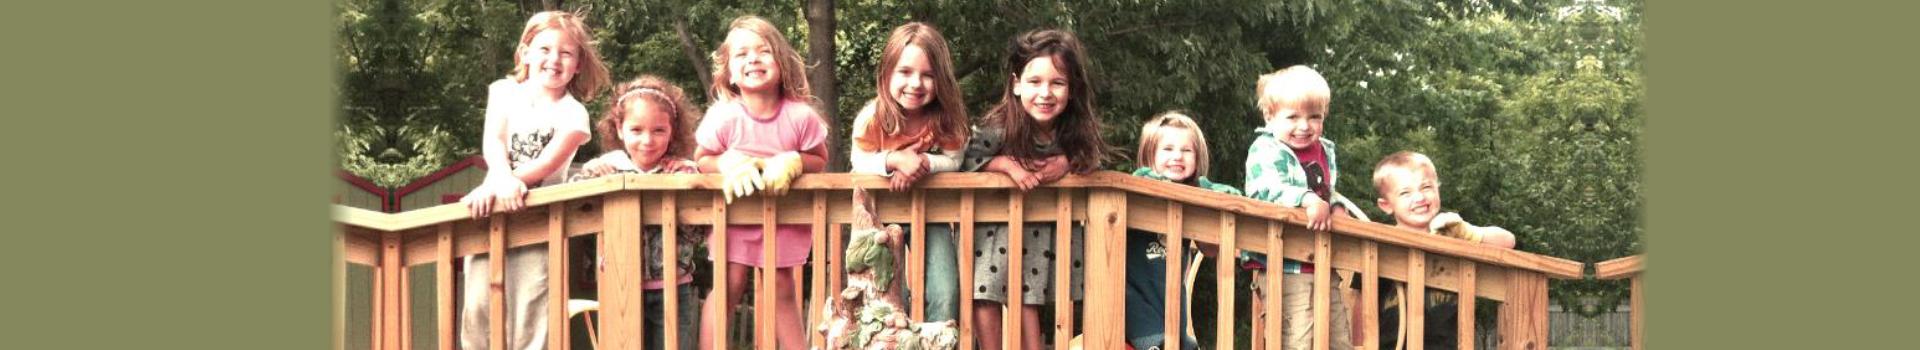 Group of Children standing